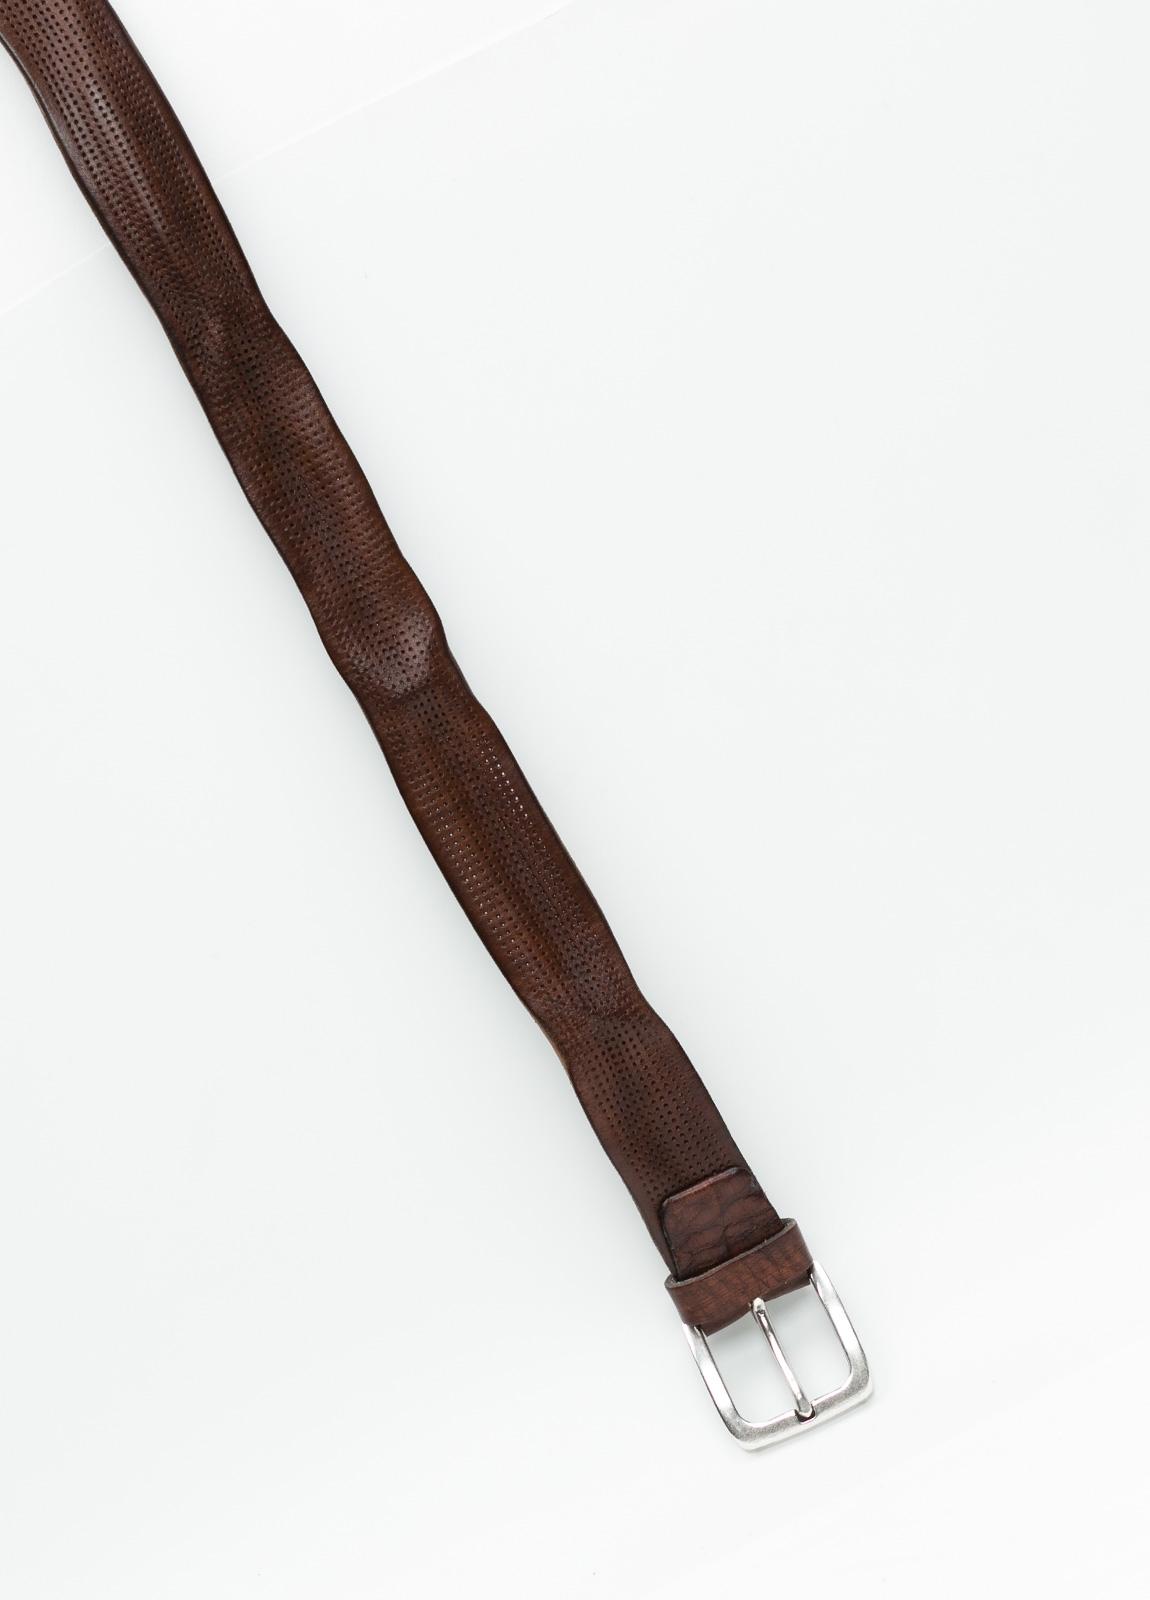 Cinturón sport piel perforada color marrón. 100% Piel. - Ítem1